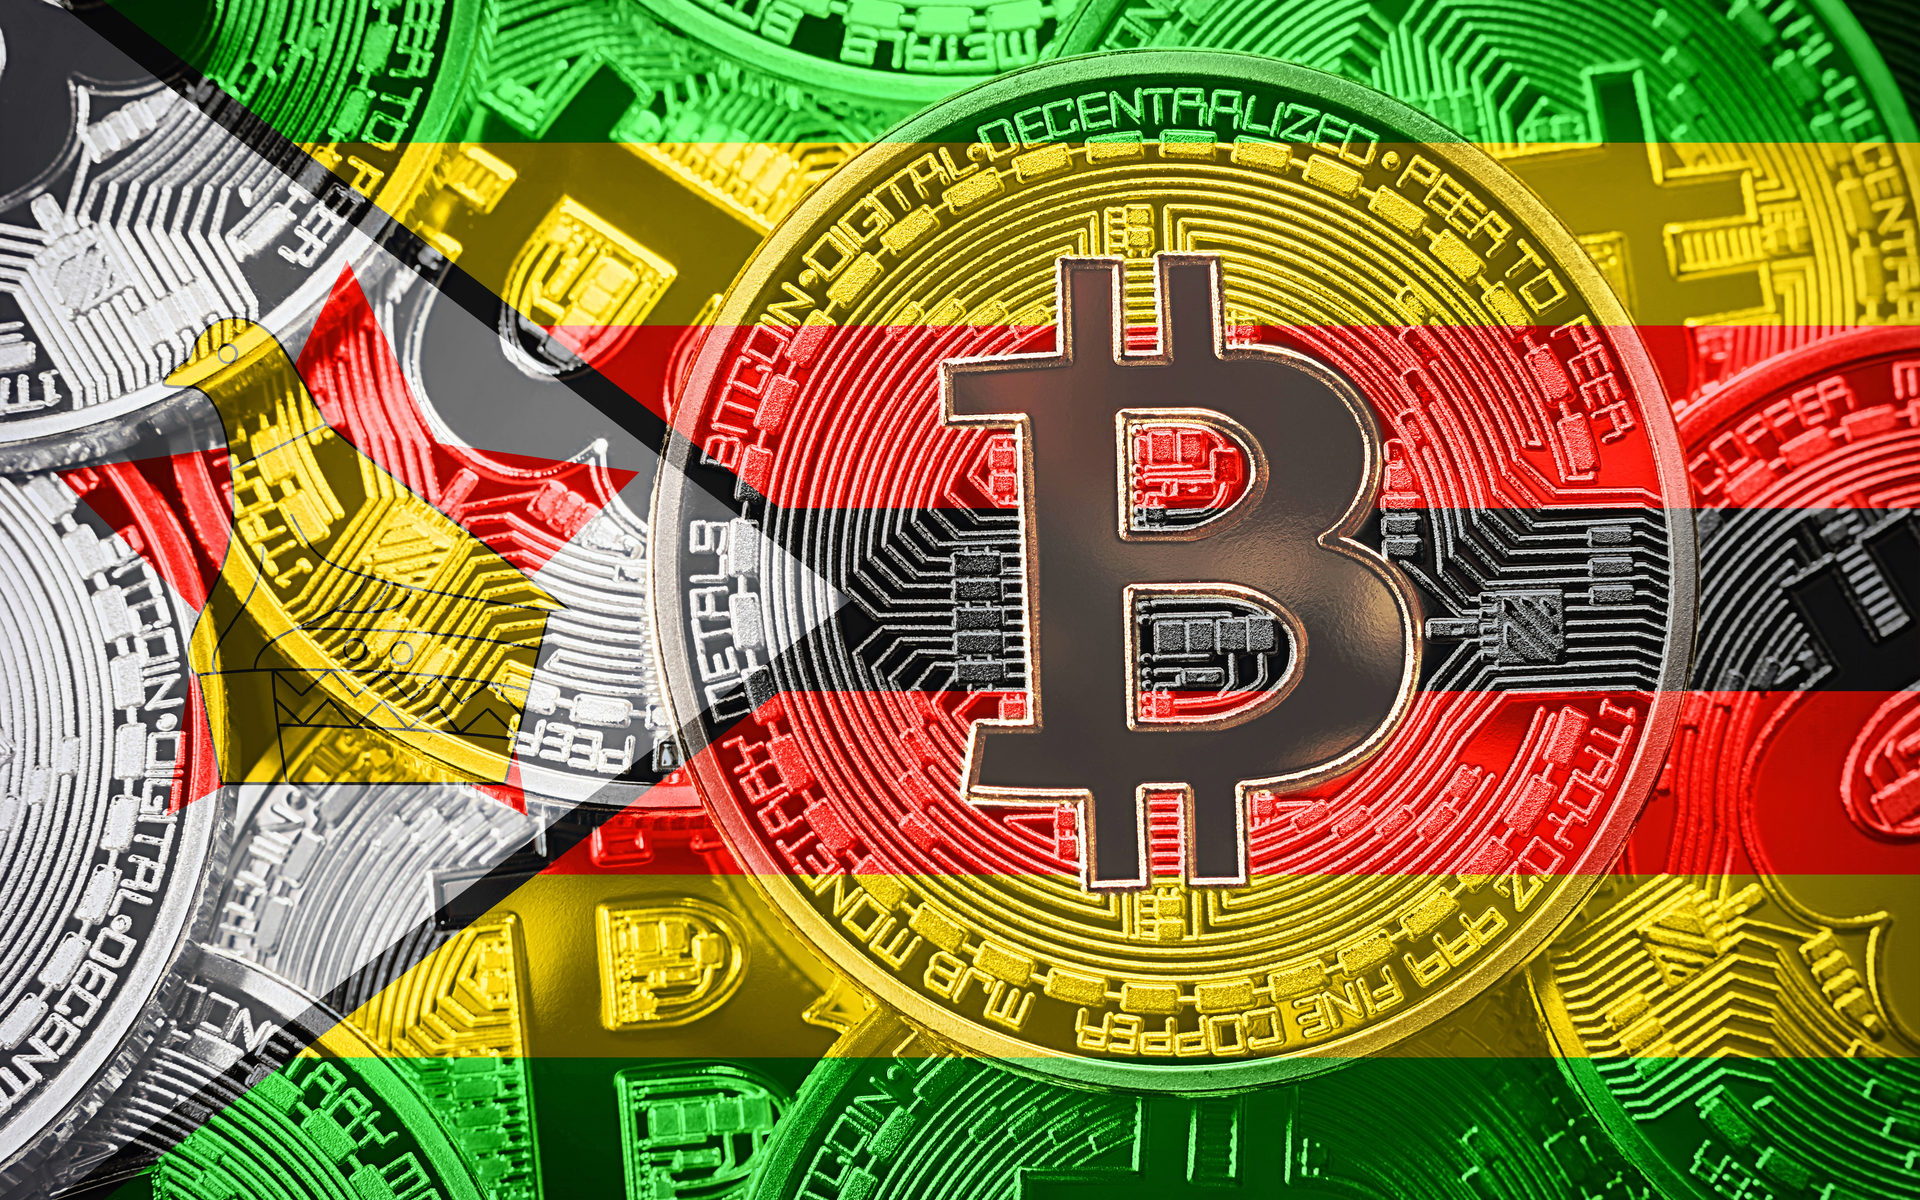 bitcoin use rising in zimbabwe